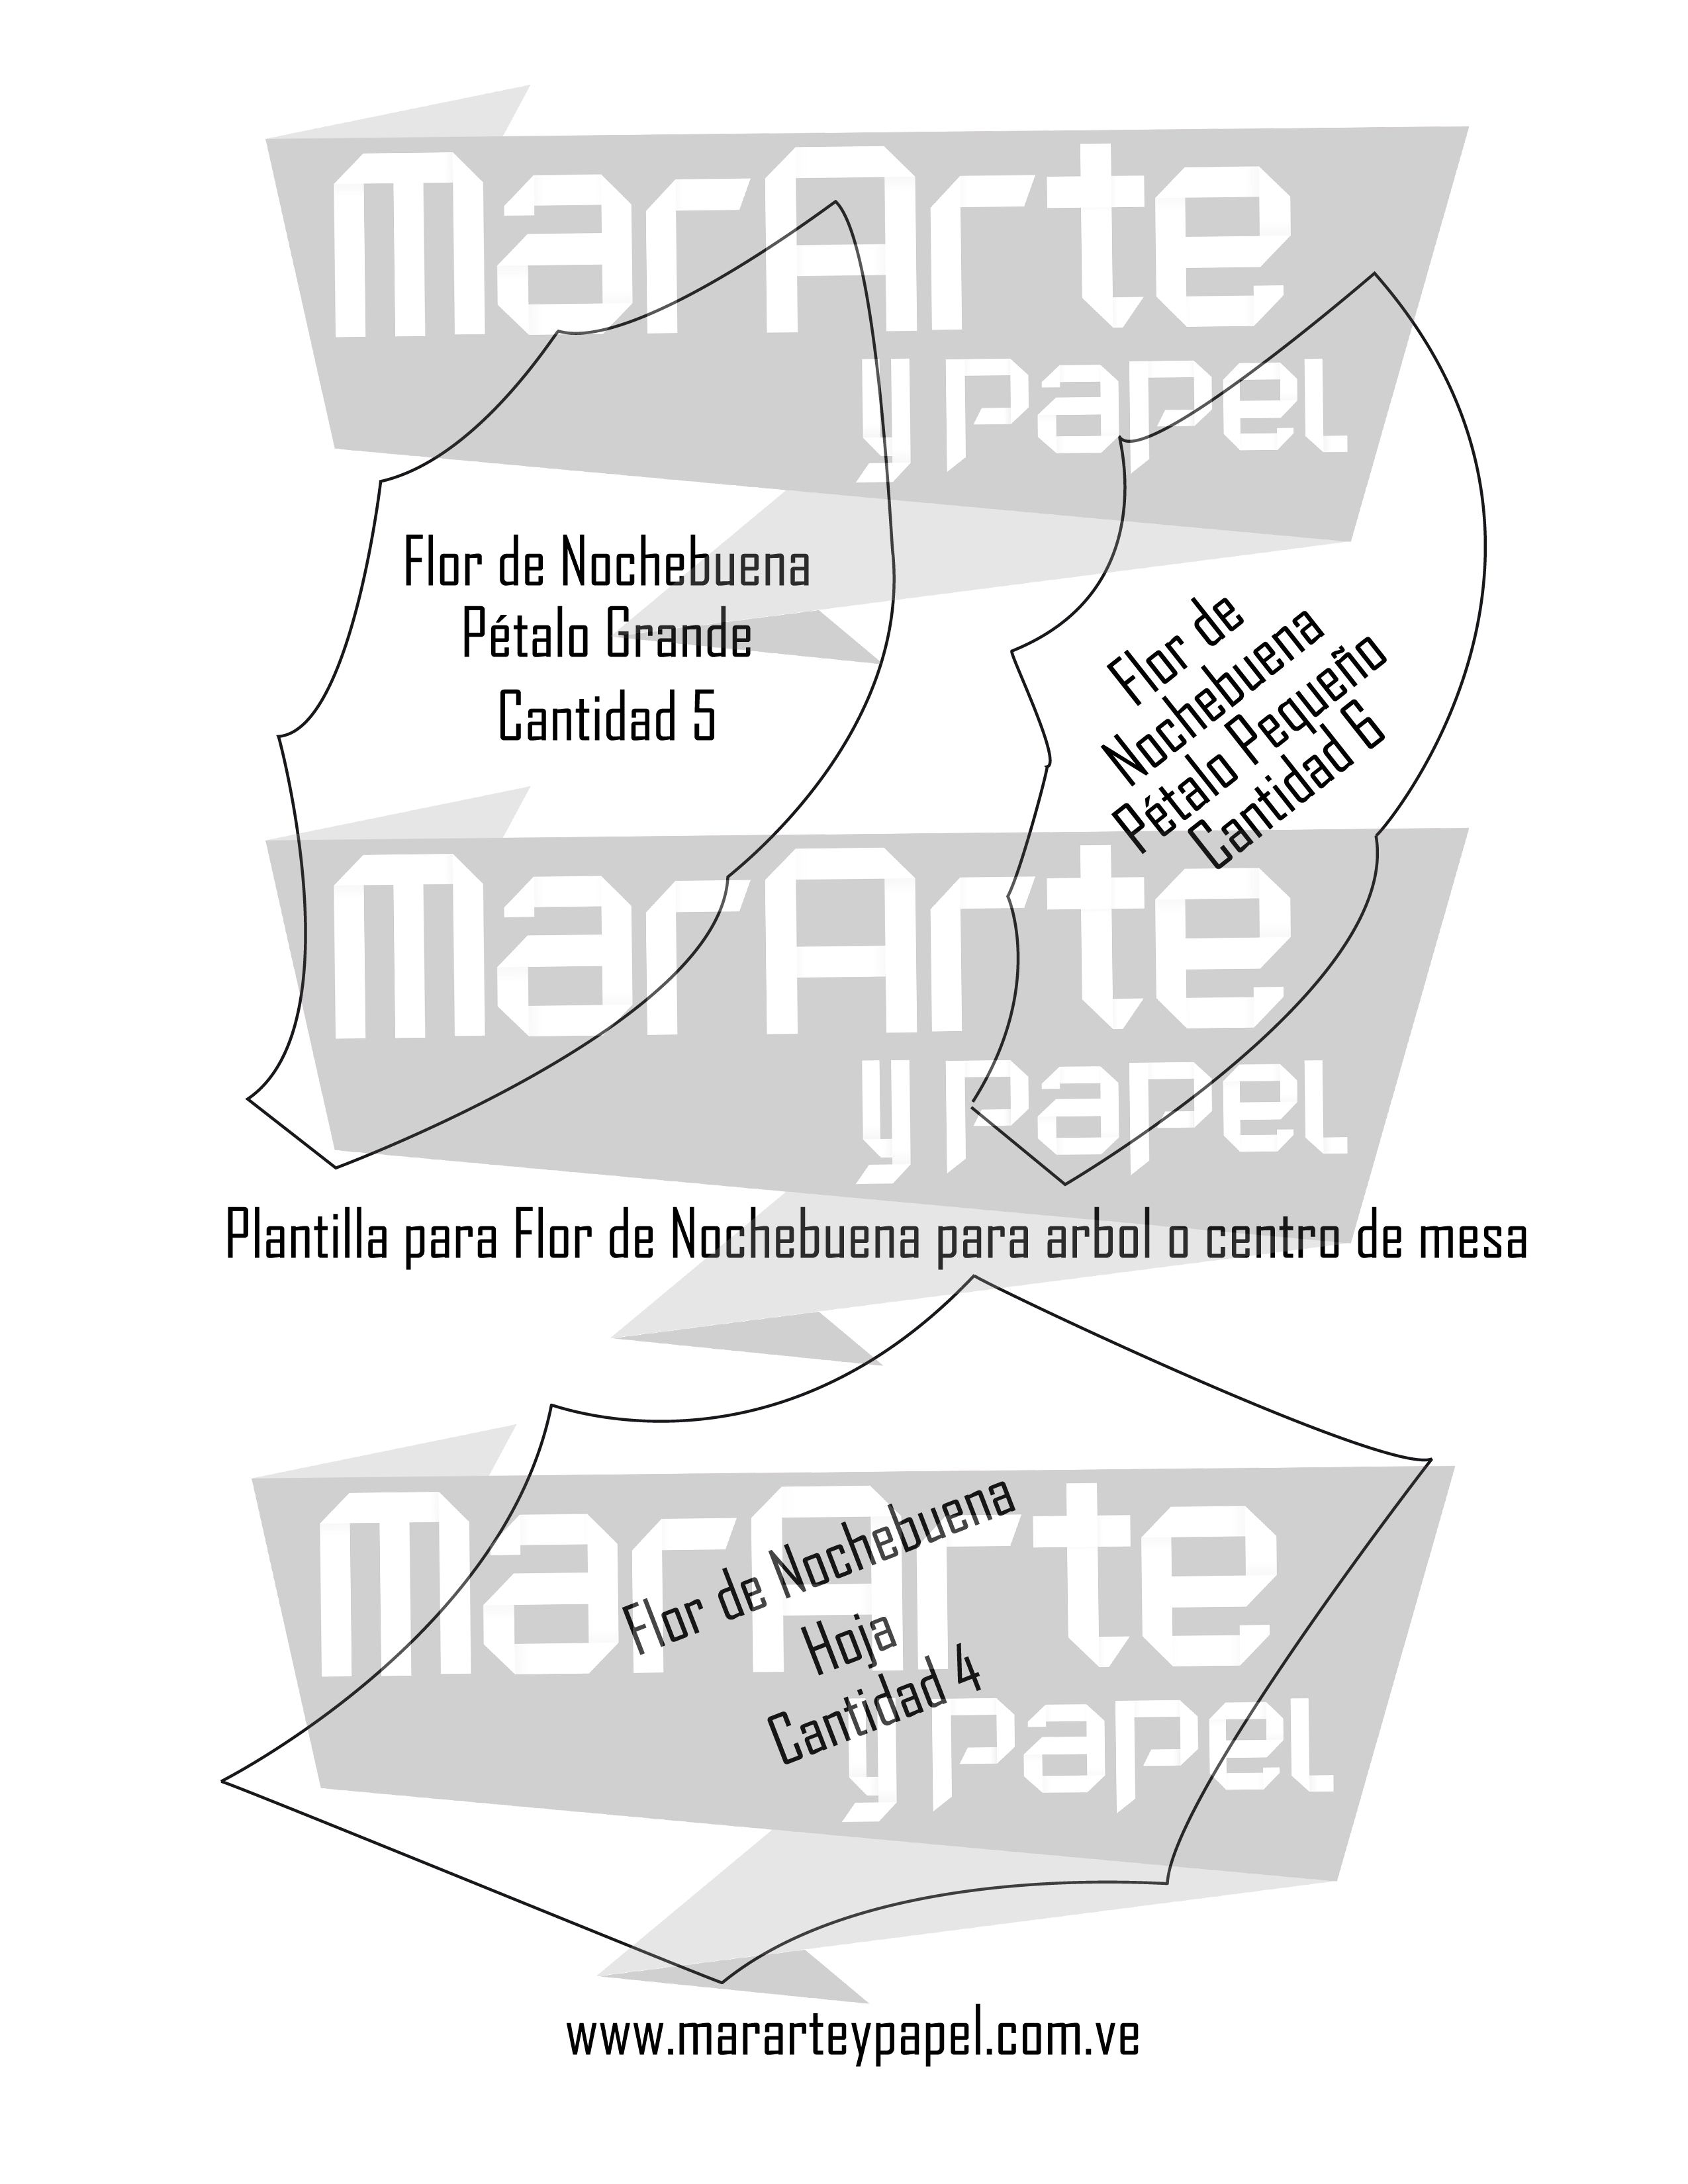 Encantador Ejemplos De Reanudar Enfermera Médica Quirúrgica Bosquejo ...